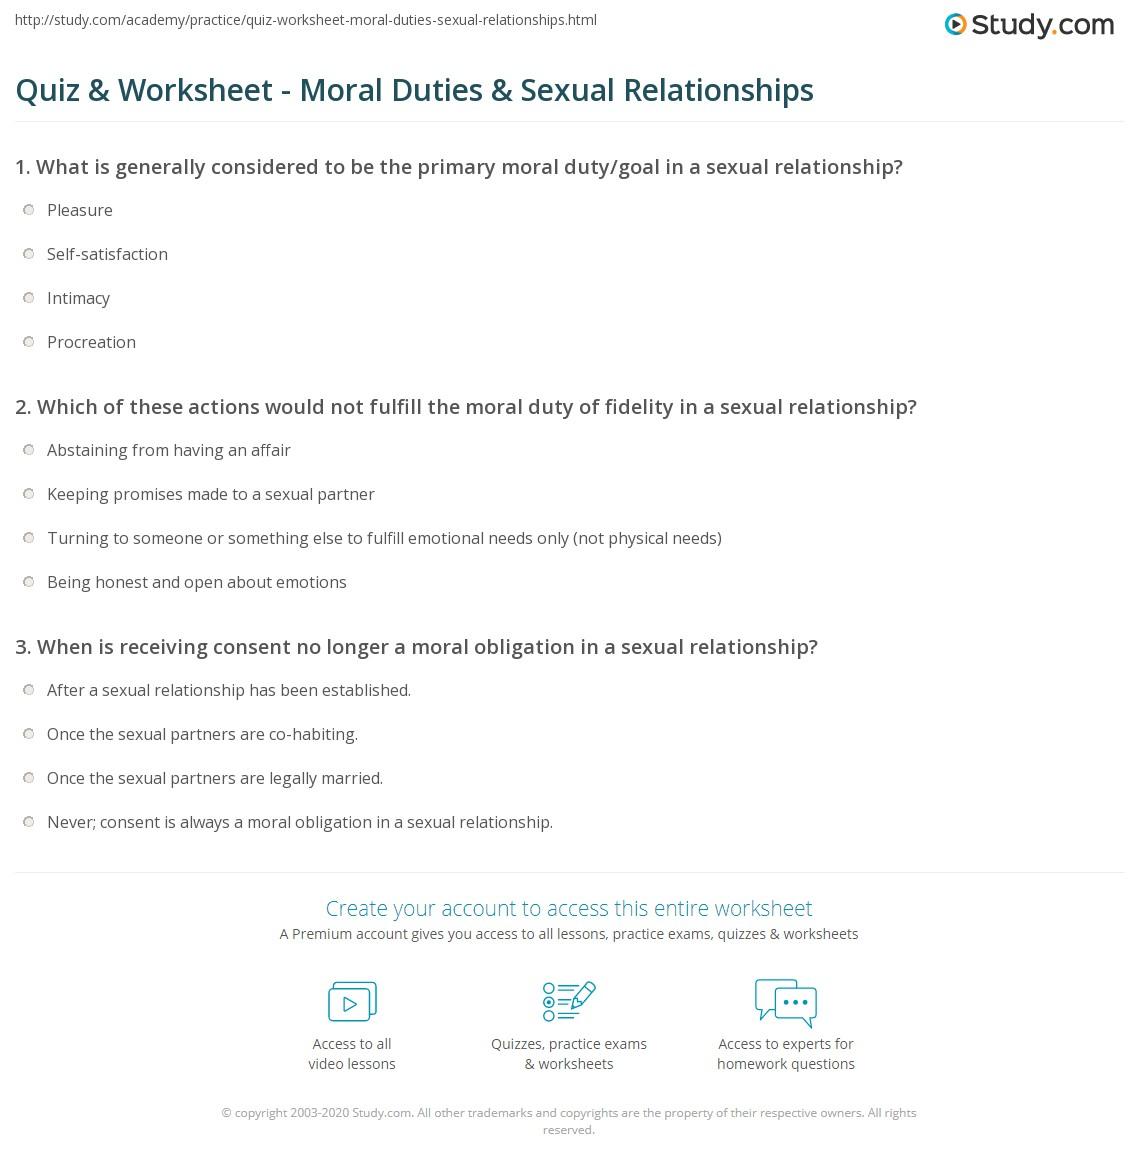 Sexual relationship quiz